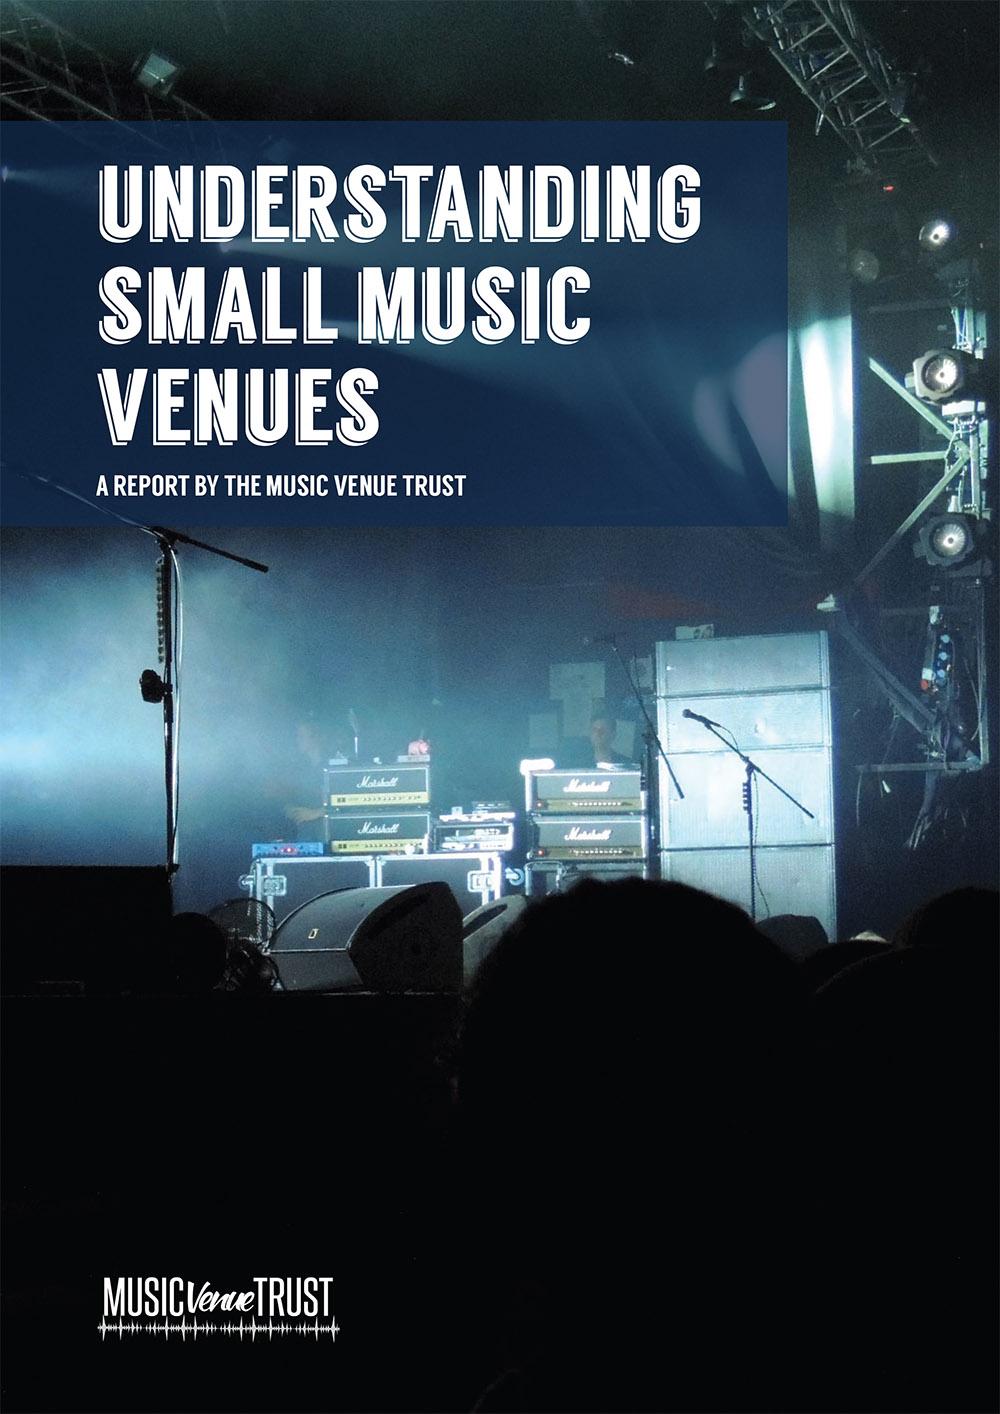 Understanding Small Music Venues